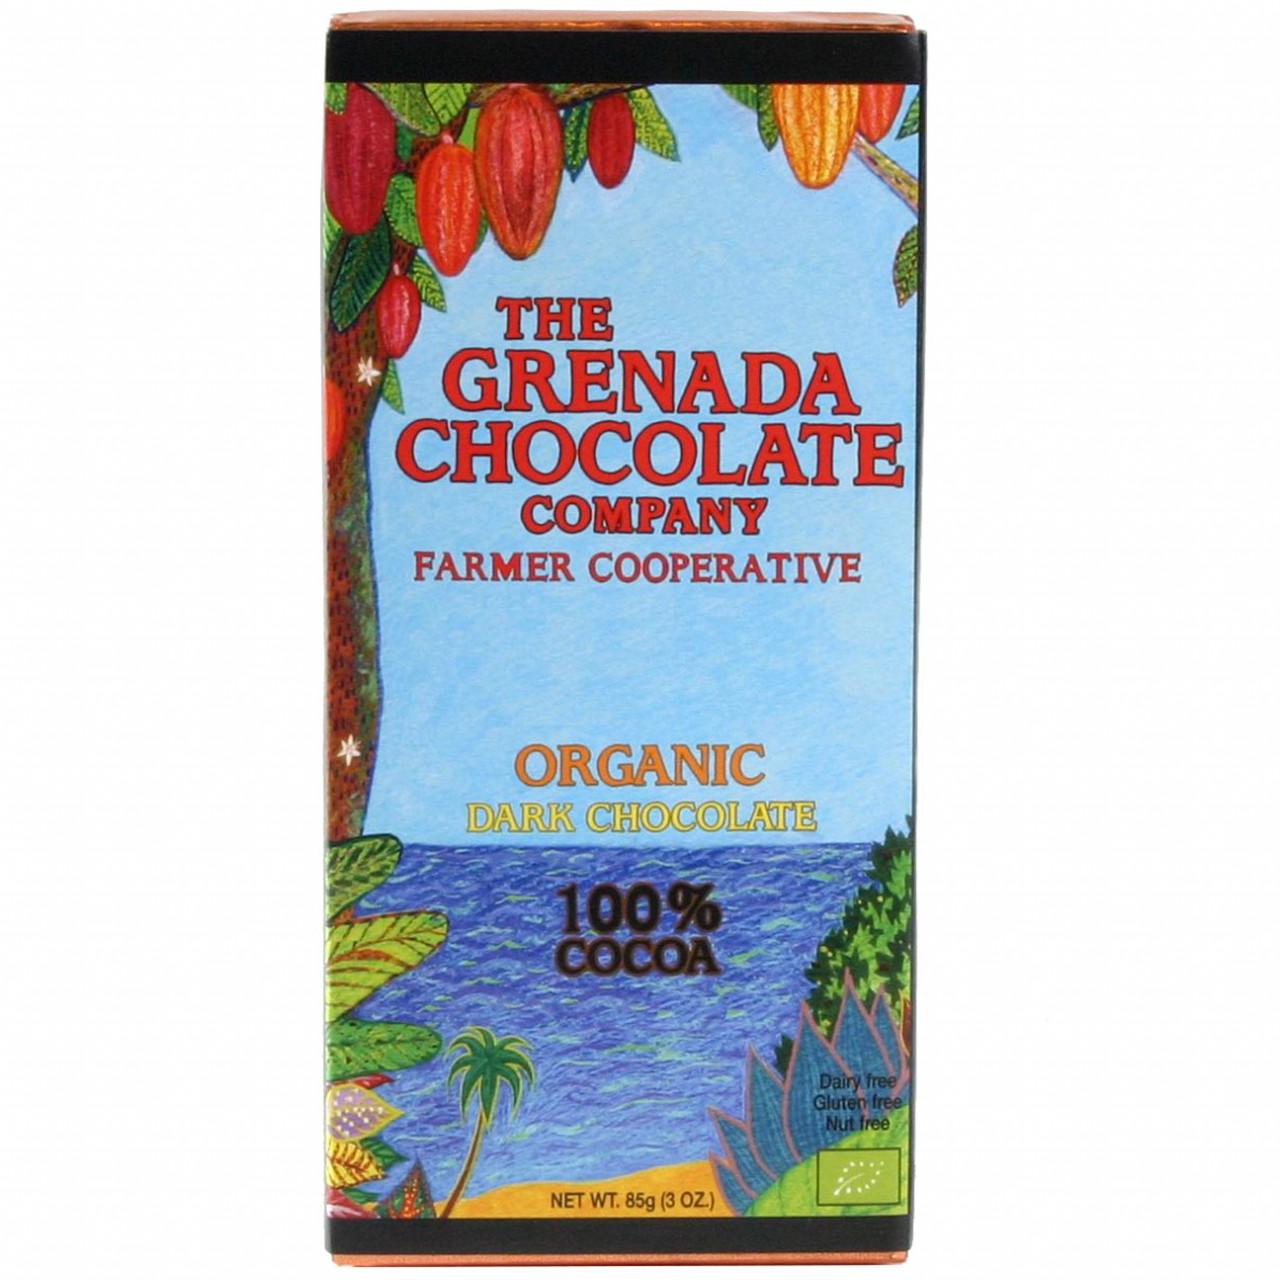 Grenada Chocolate, dunkle Bio Schokolade, Organic Dark Chocolate, chocolat noir, cocoa cacao, Mott Green